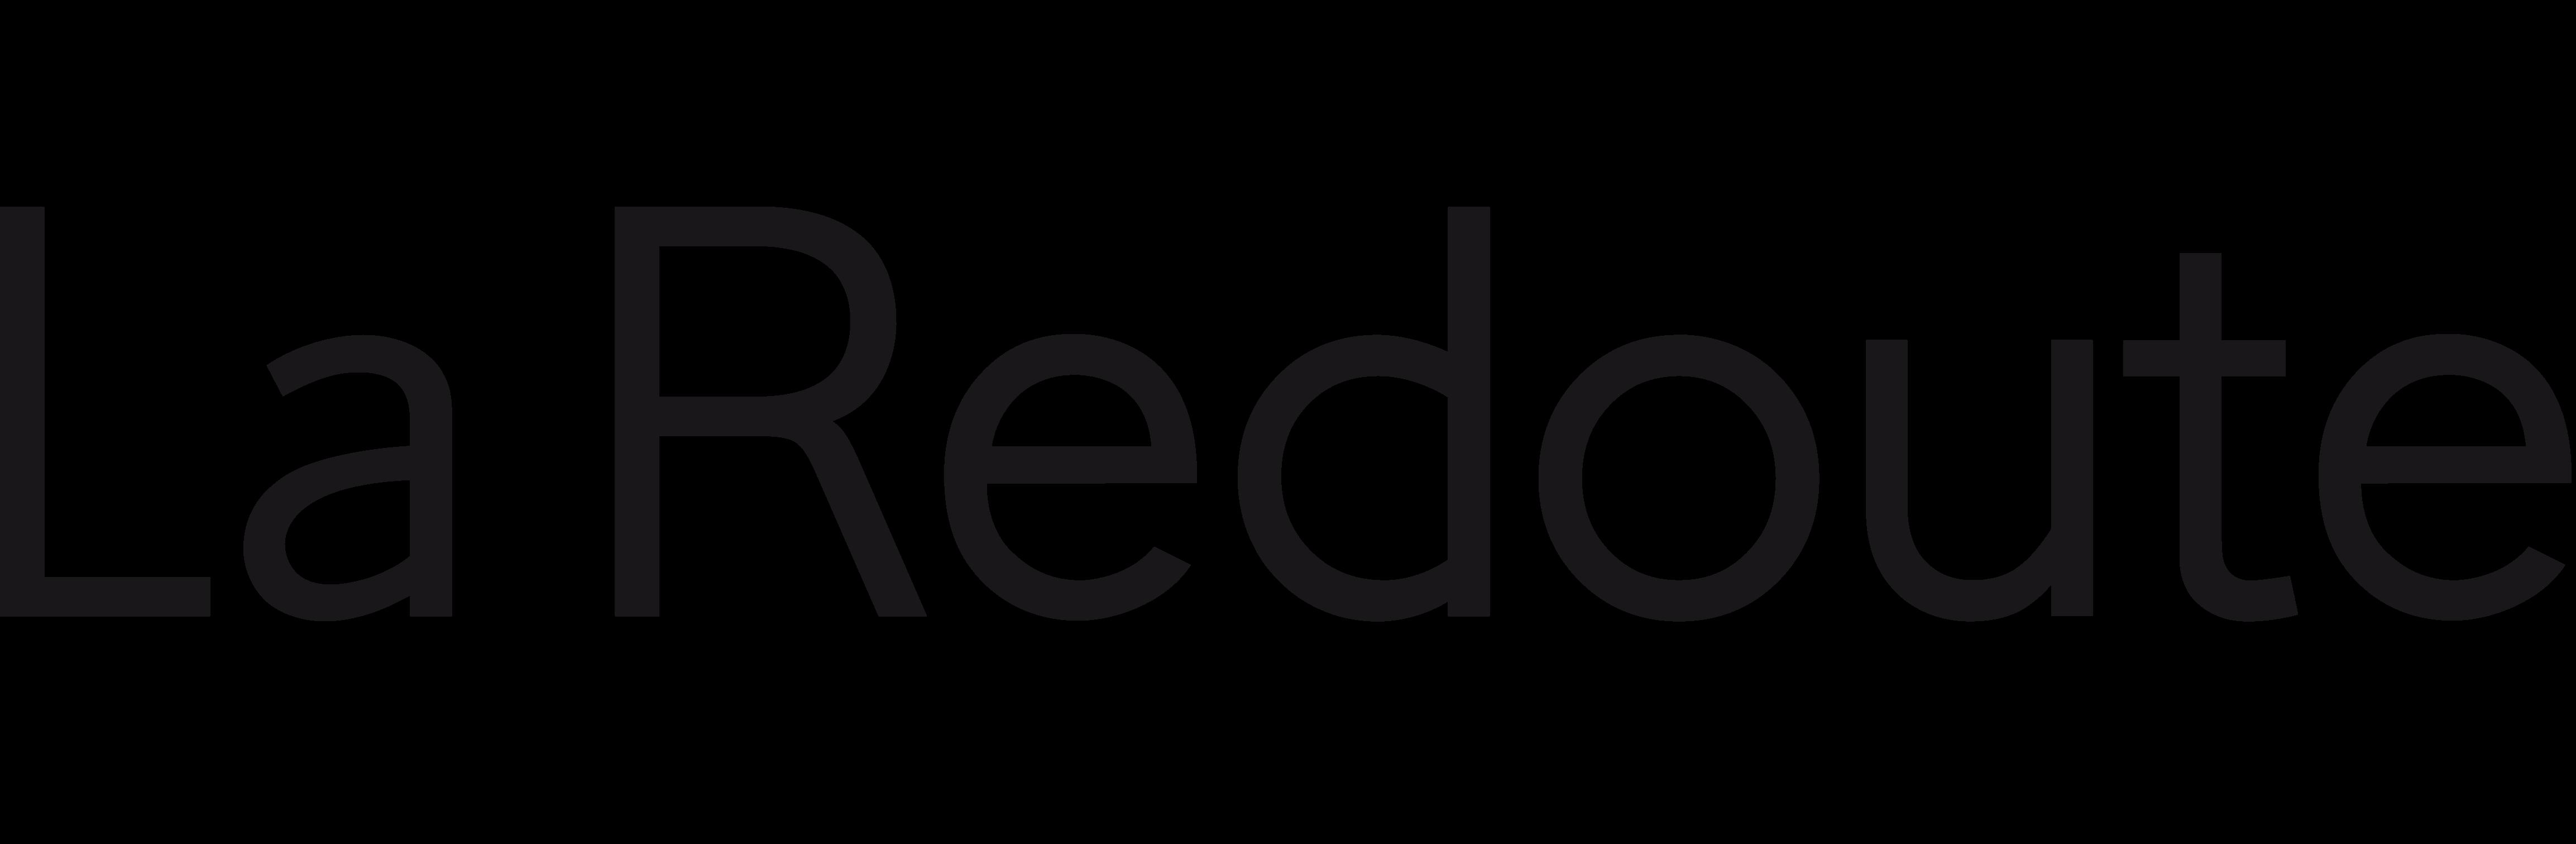 logo-la-redoute_1